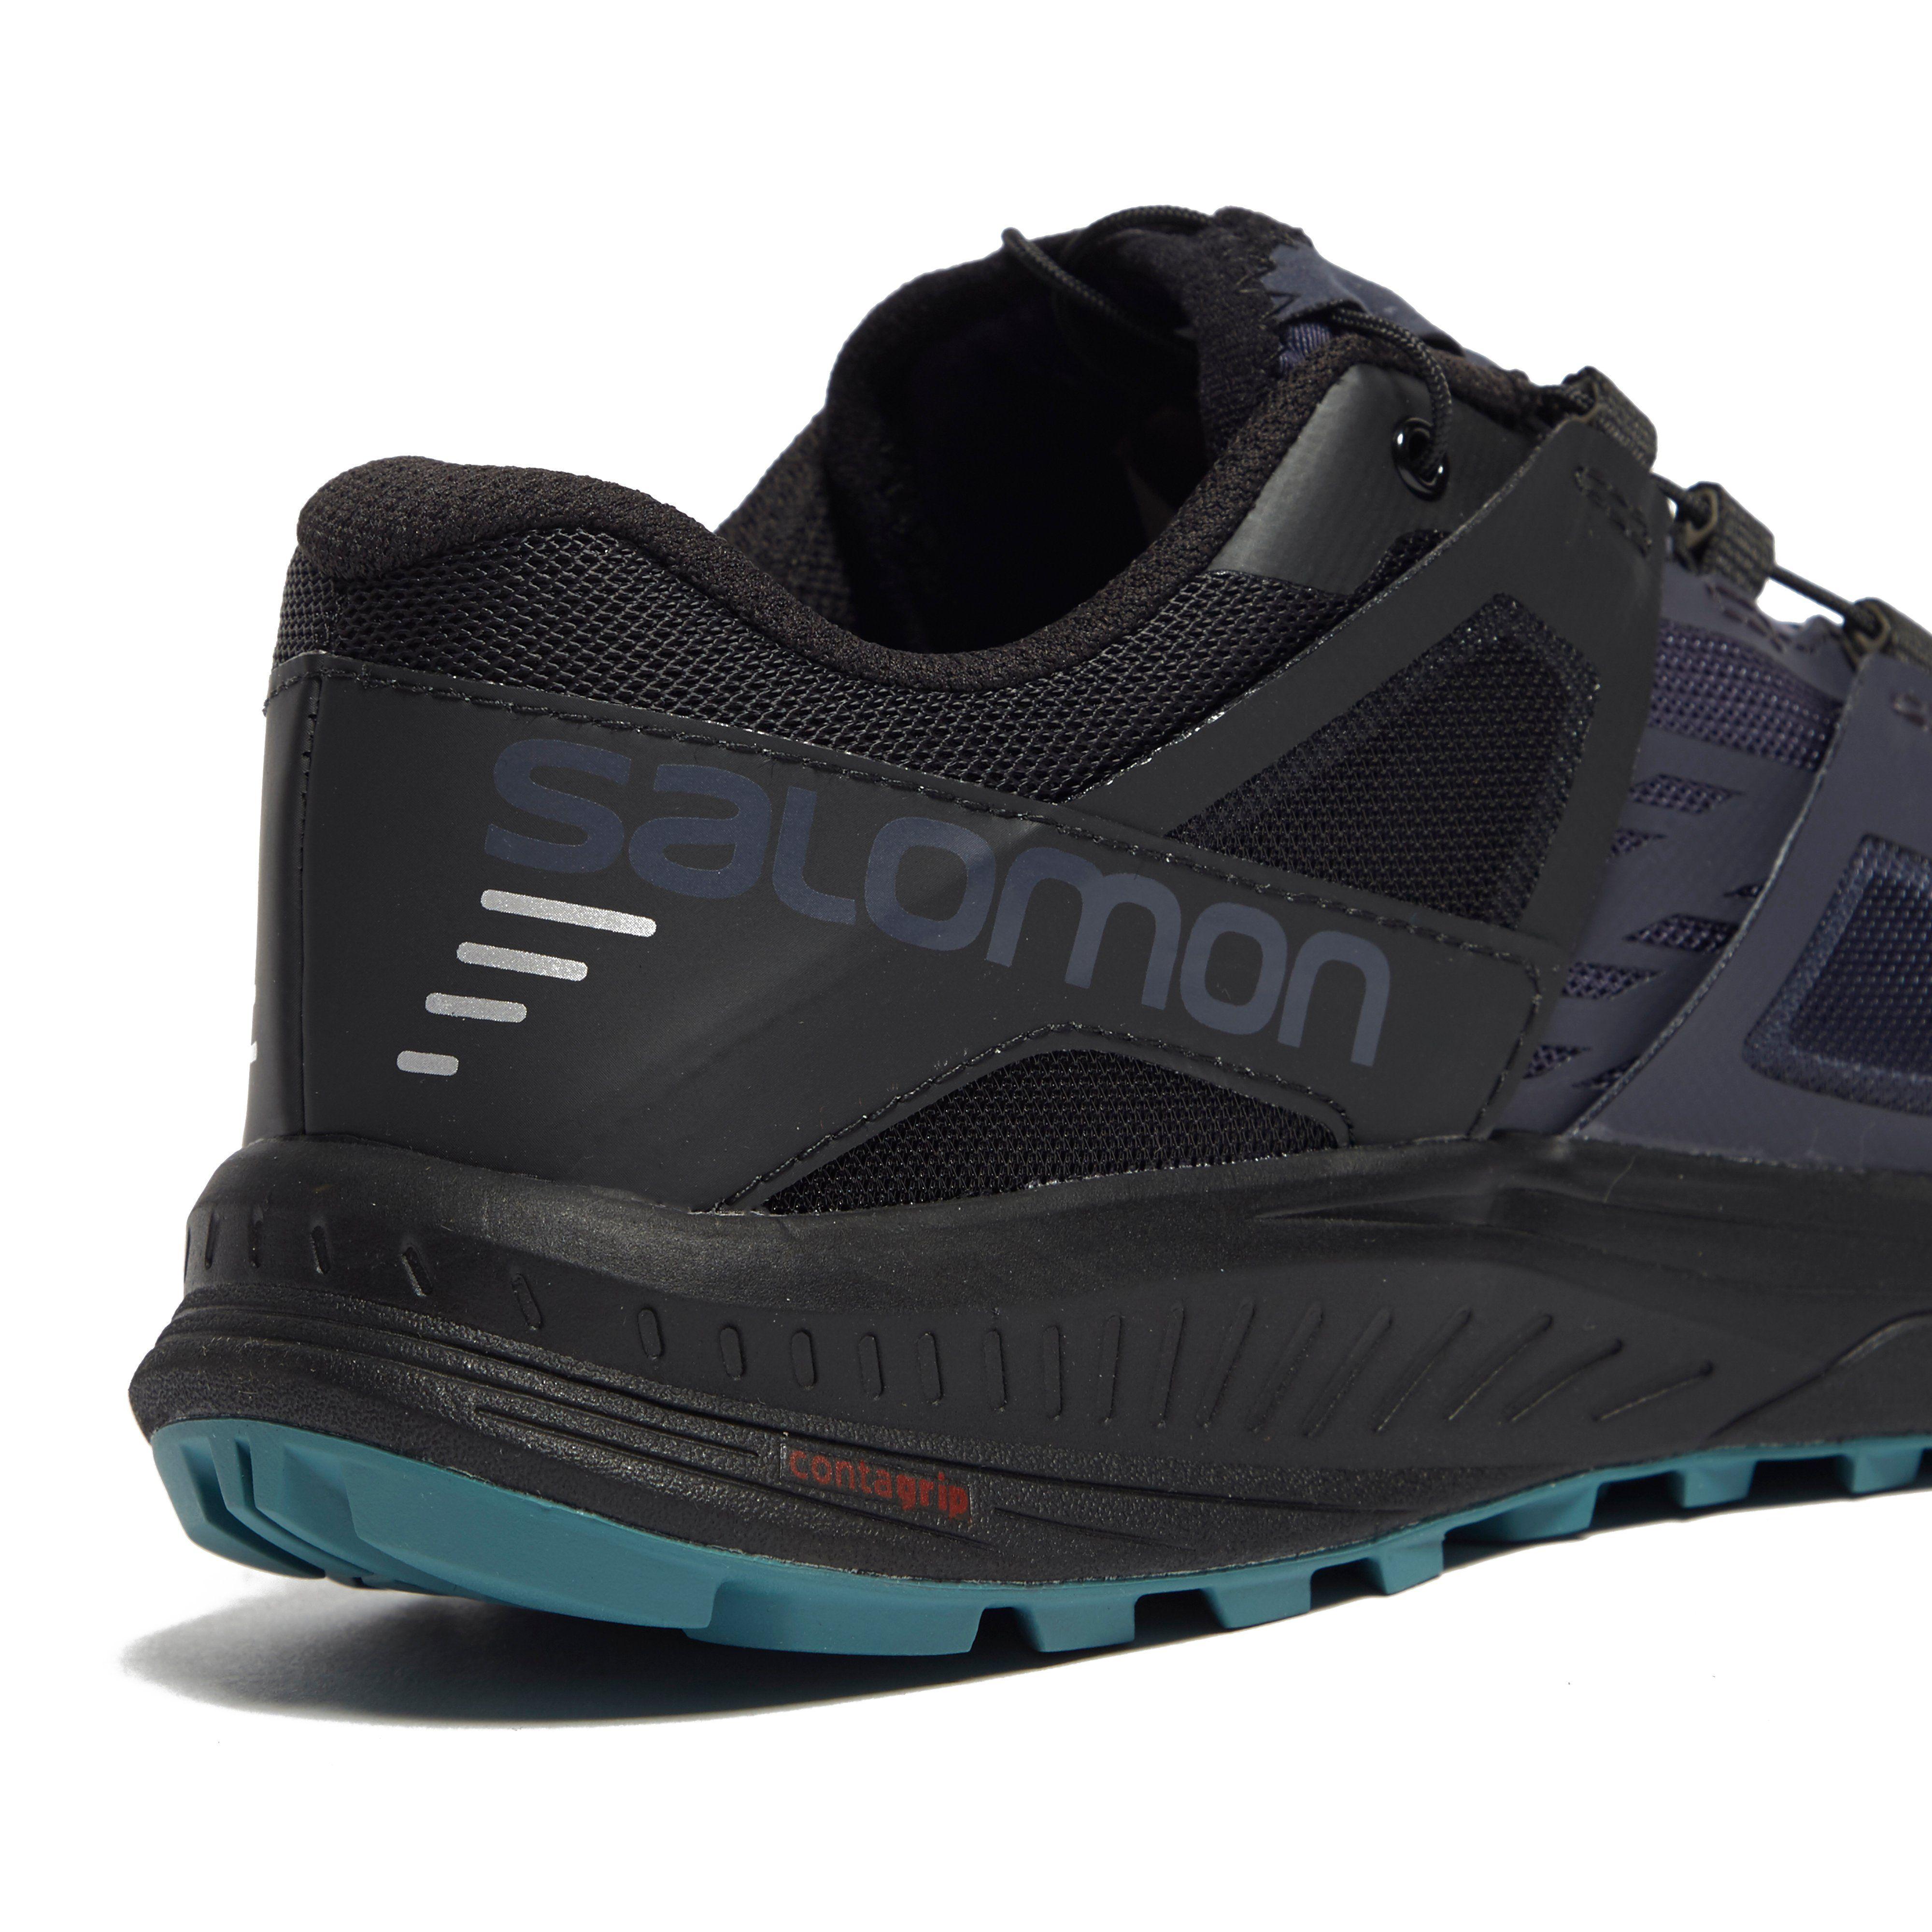 Salomon Ultra Pro Women's Trail Running Shoes